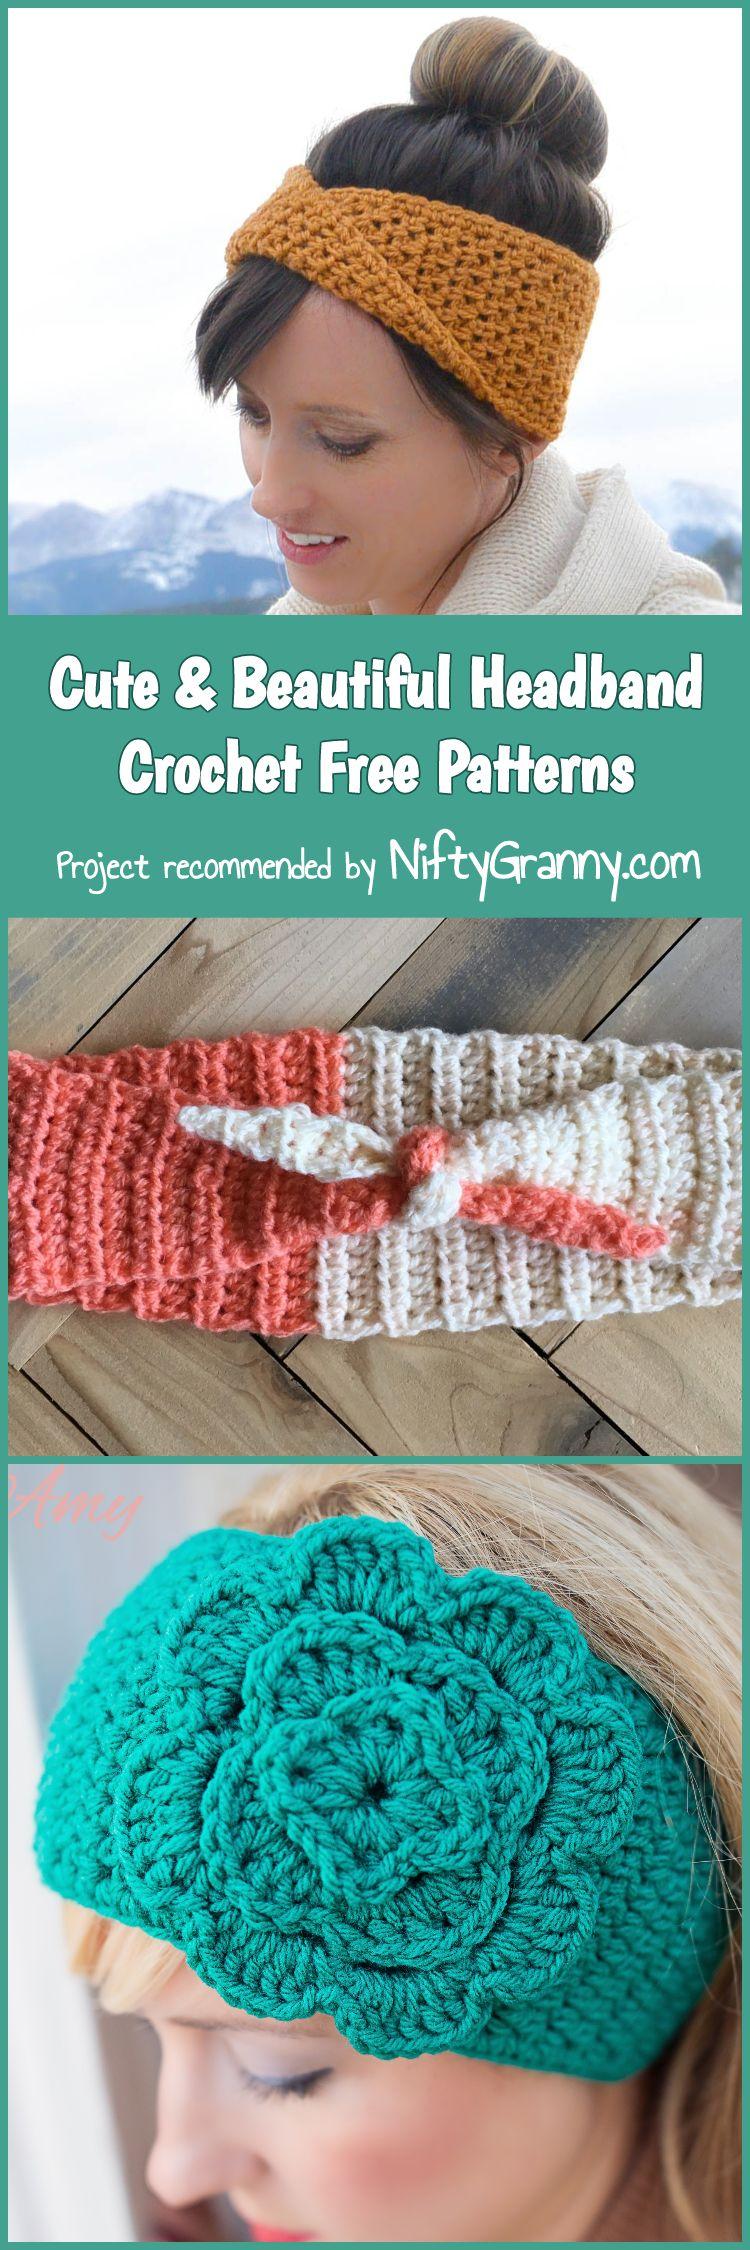 Cute & Beautiful Headband Crochet Free Patterns   crochet